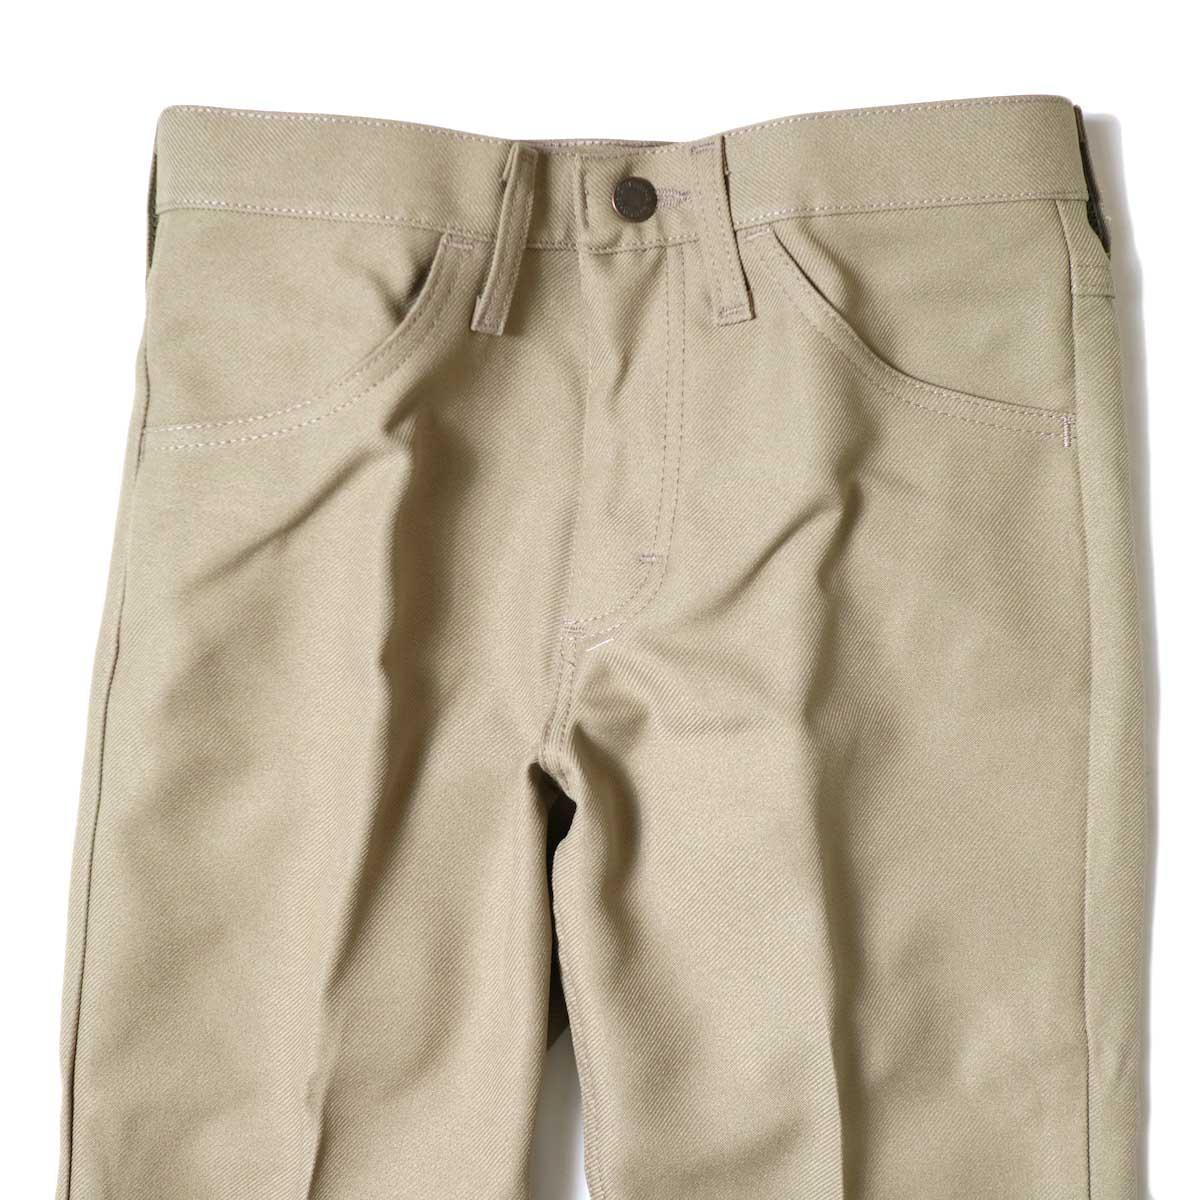 Wrangler / WRANCHER DRESS JEANS (Tan) ウエスト